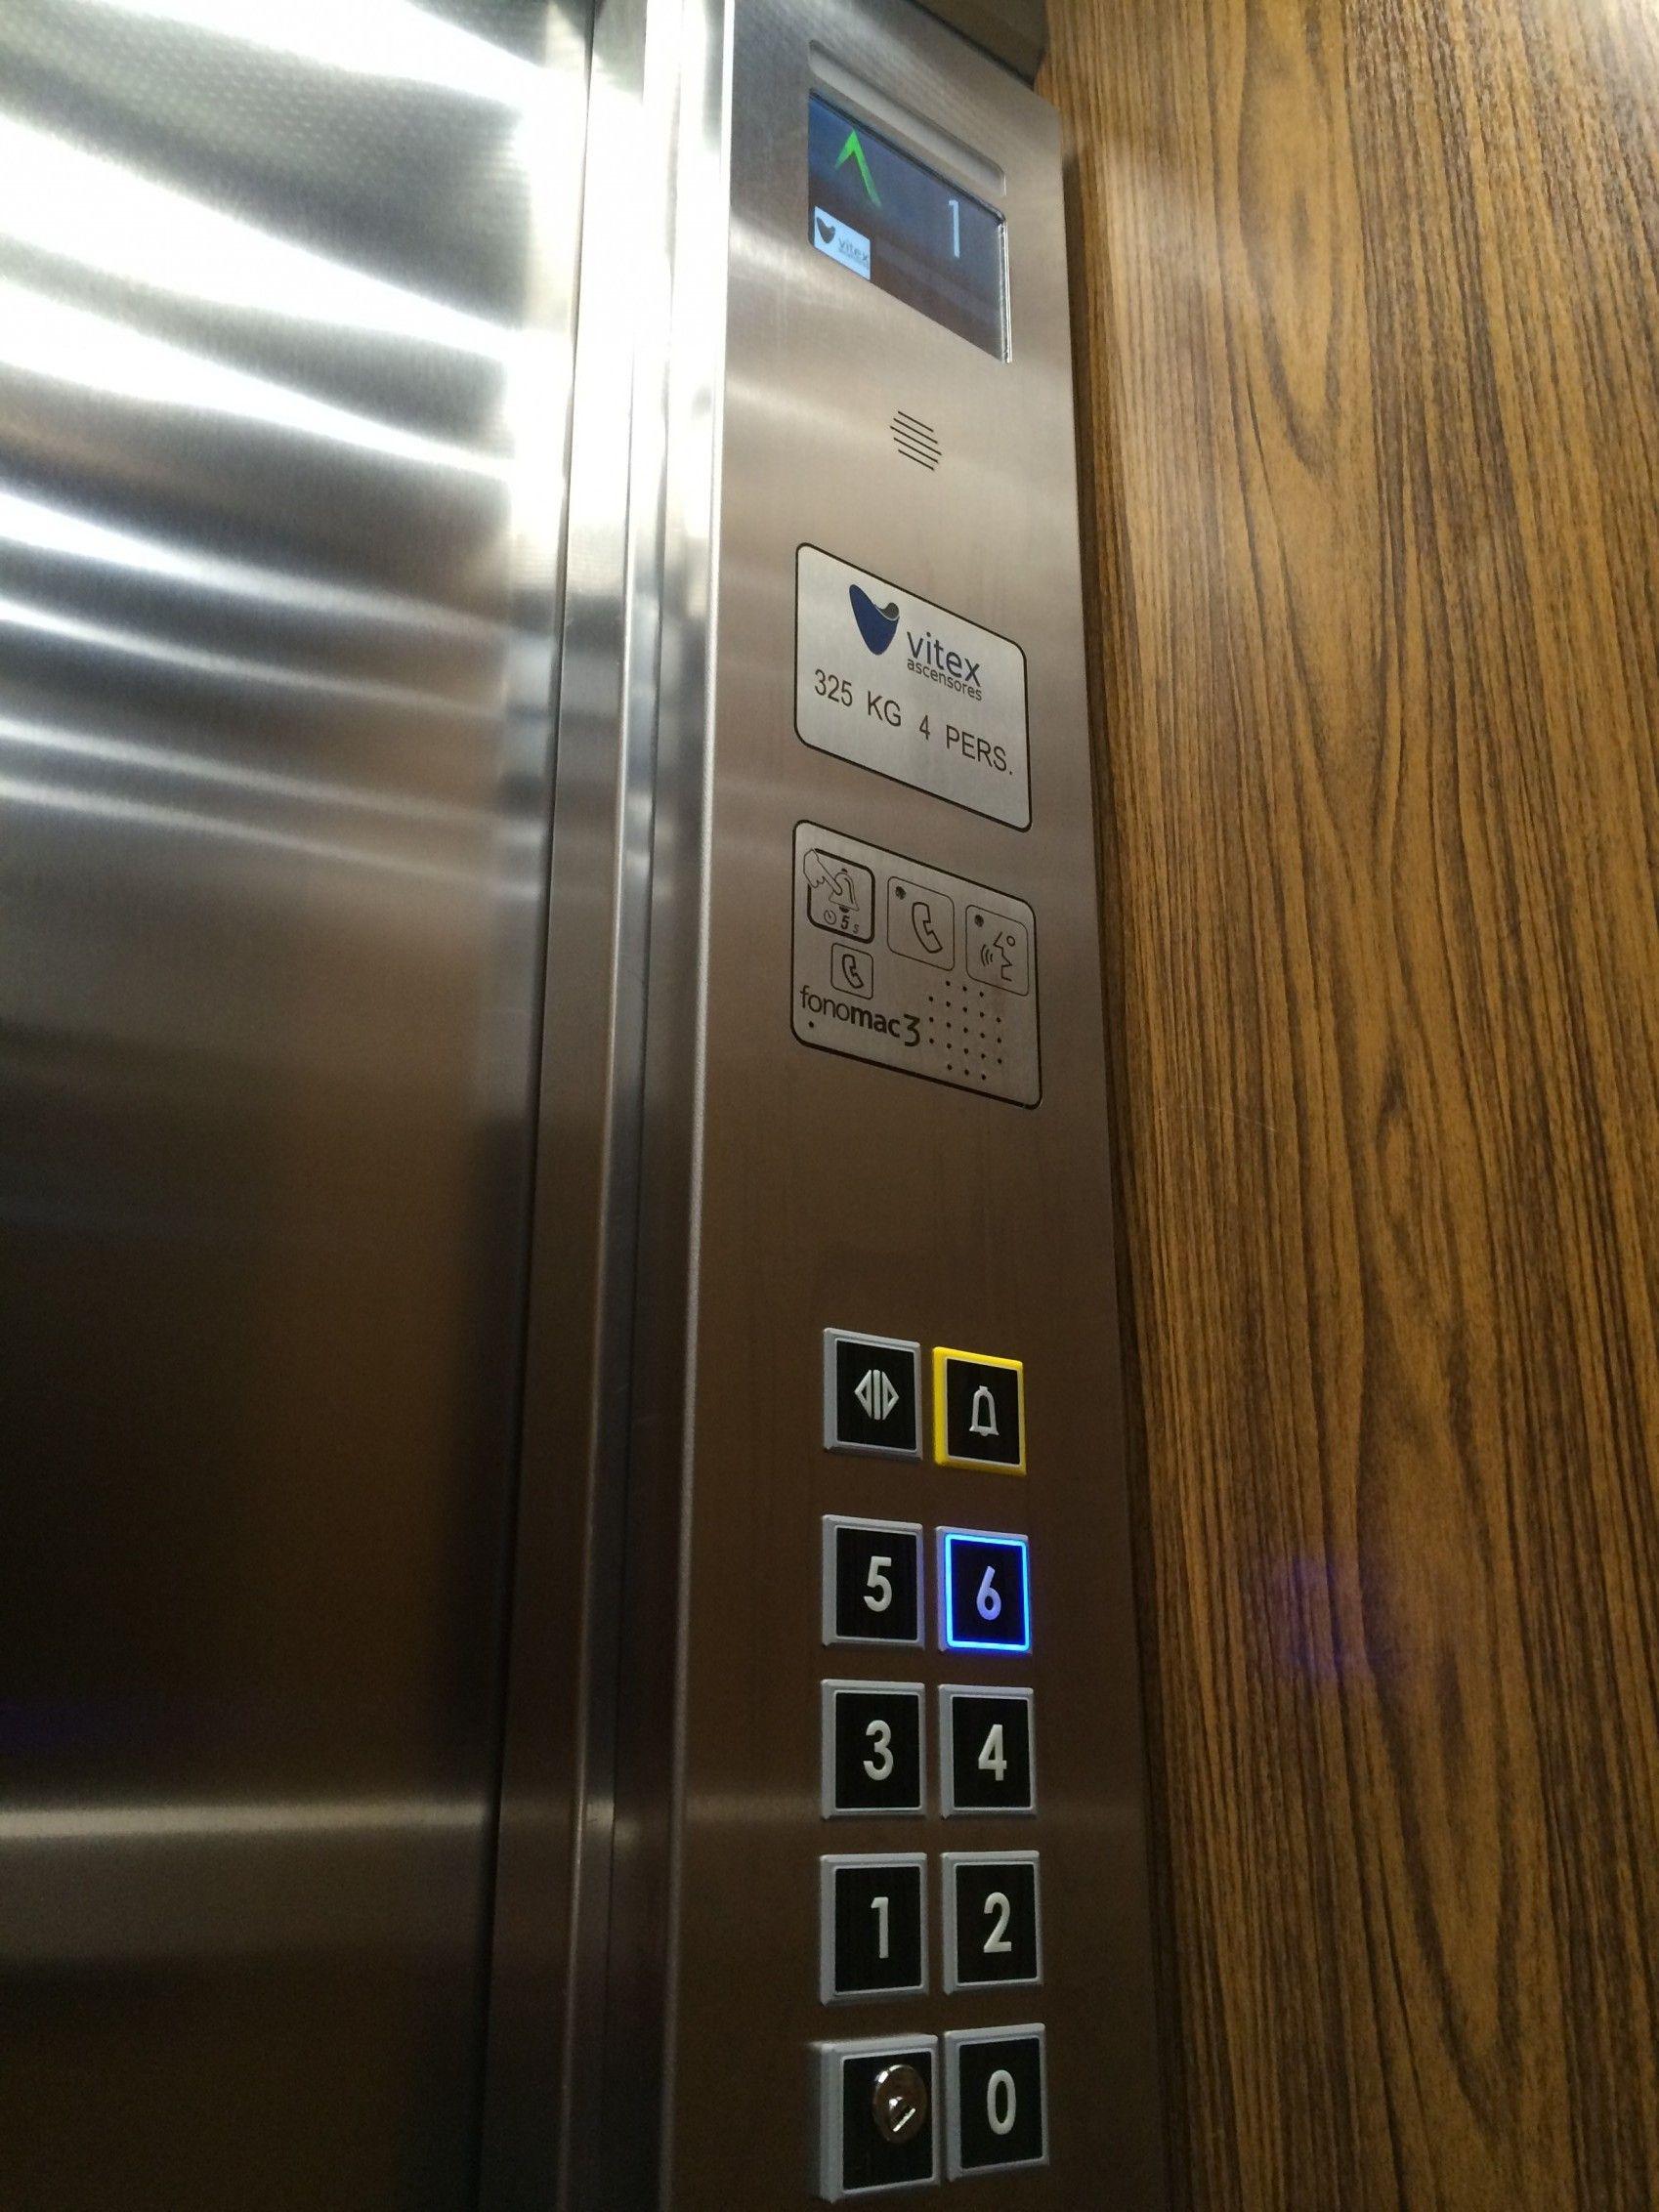 Renovación de cabinas: Servicios de Vitex Ascensores